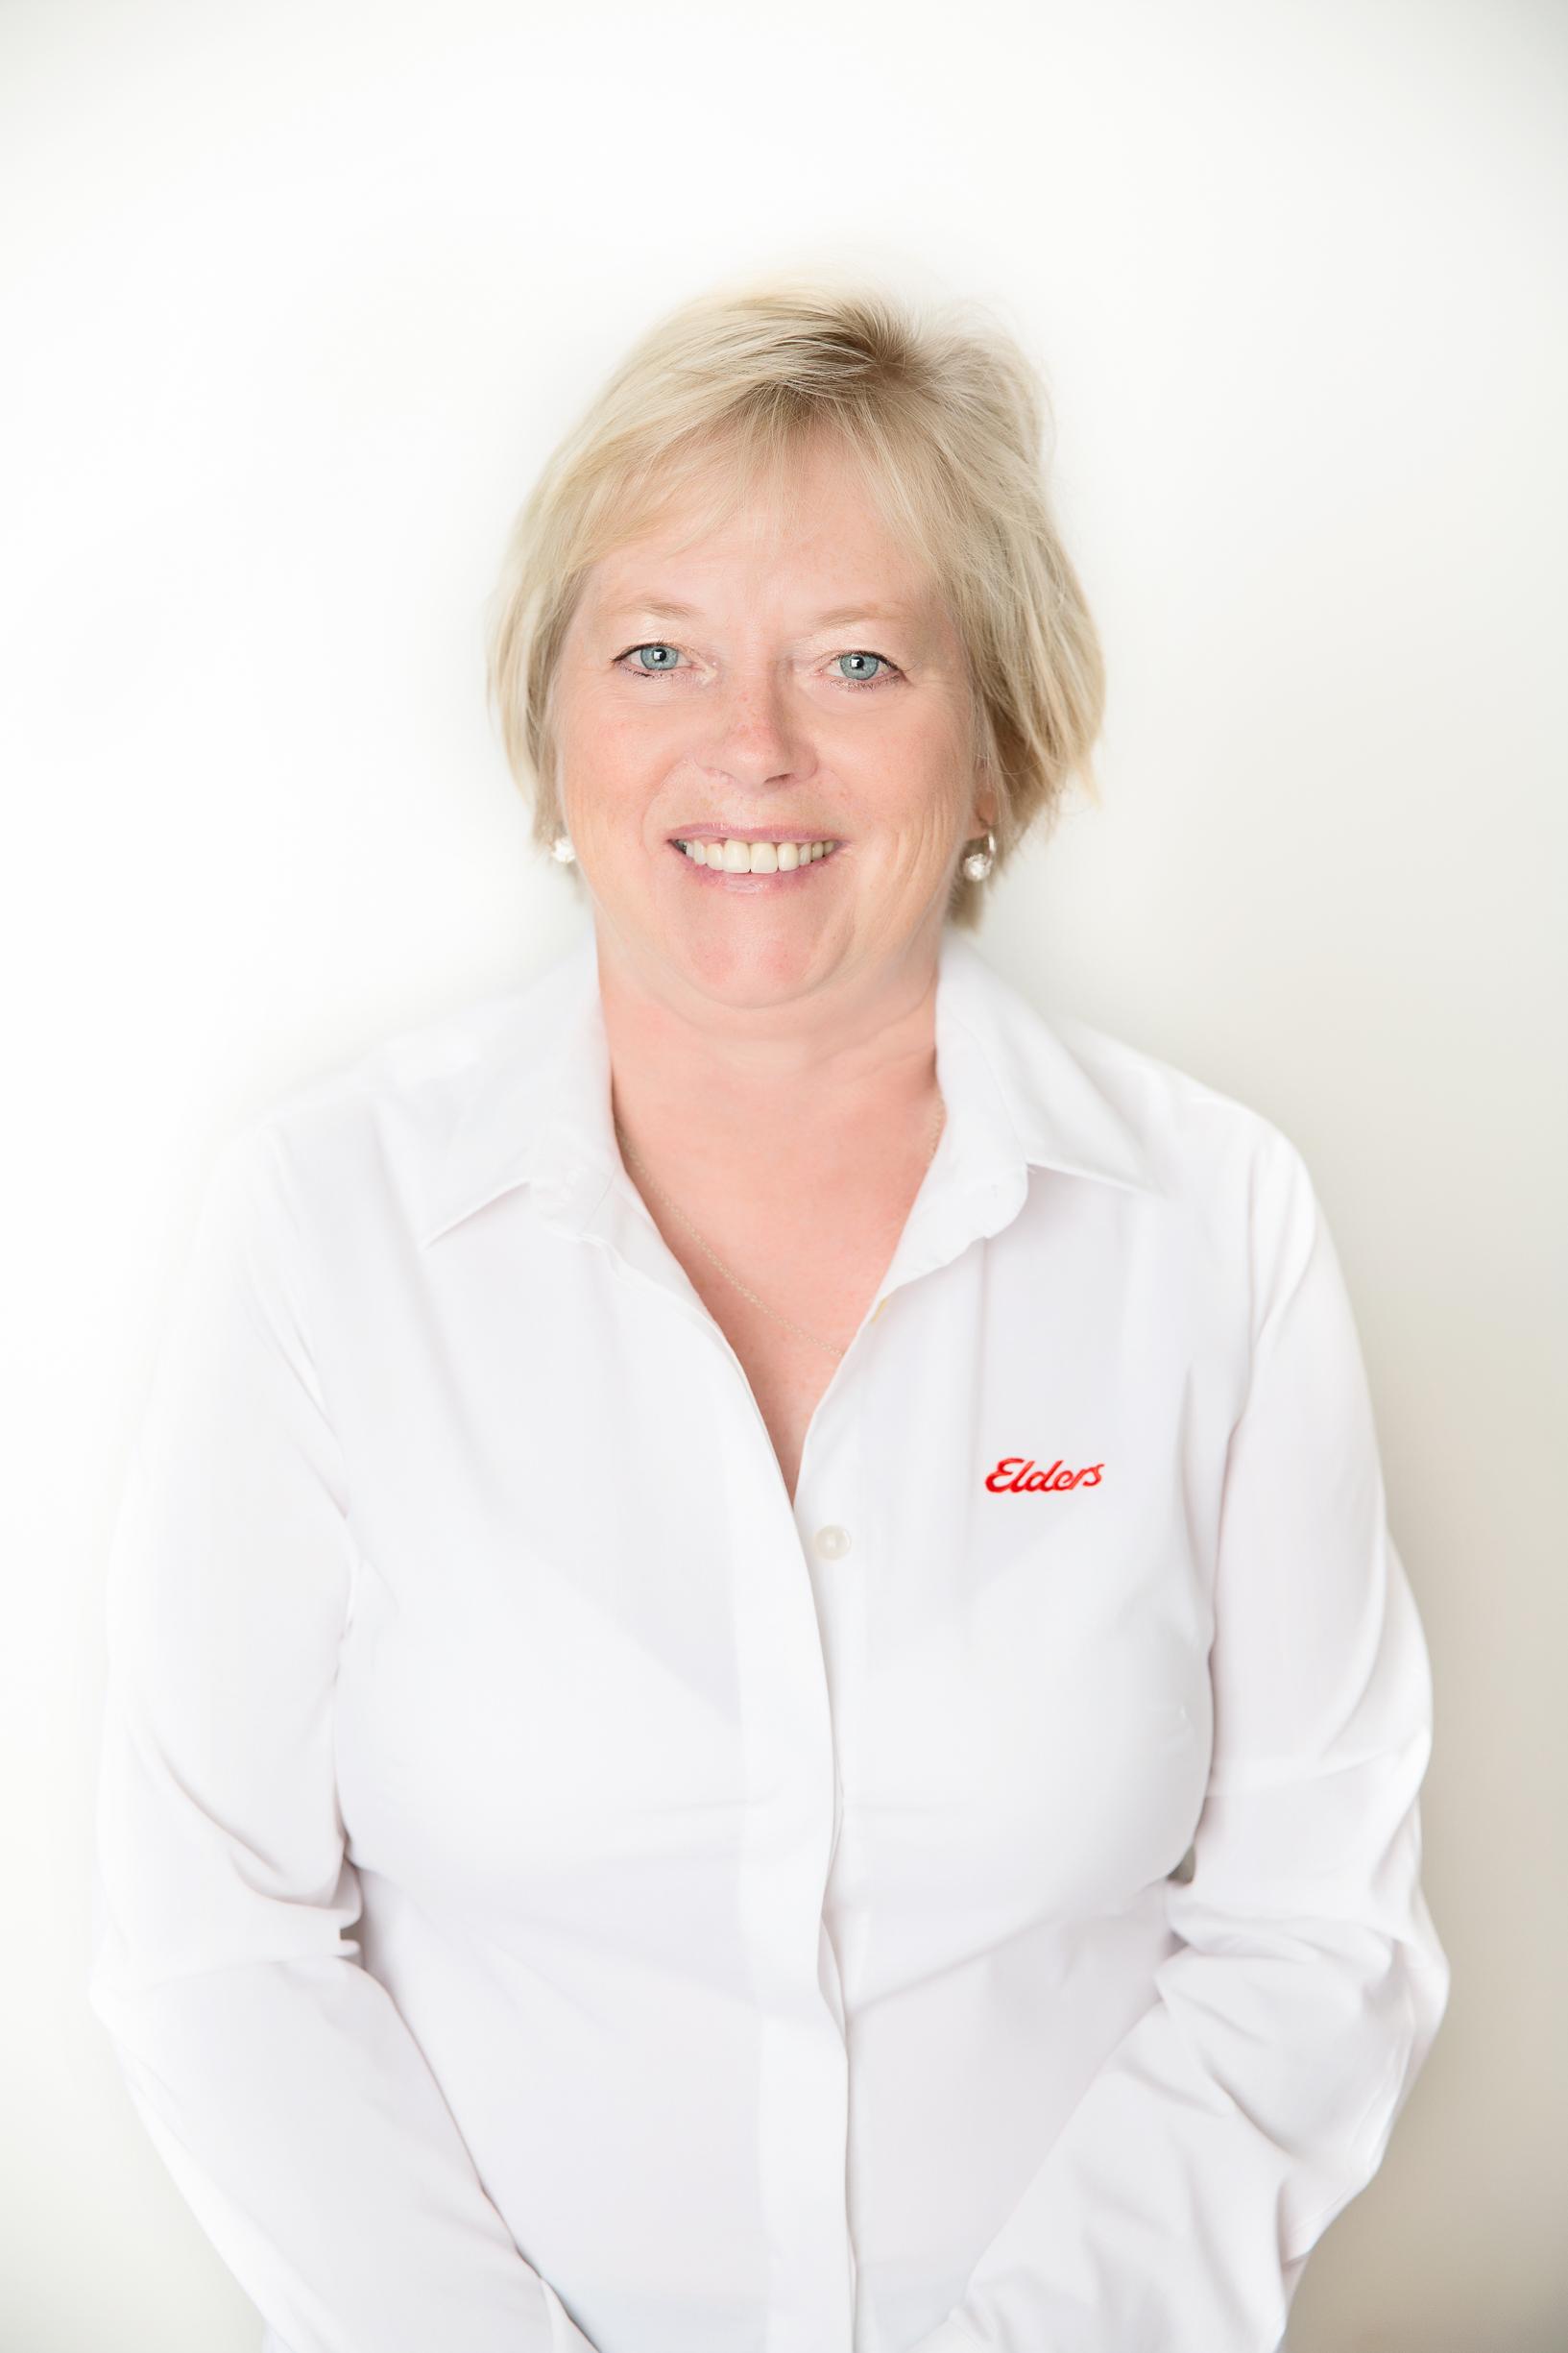 Jeanette Suffield